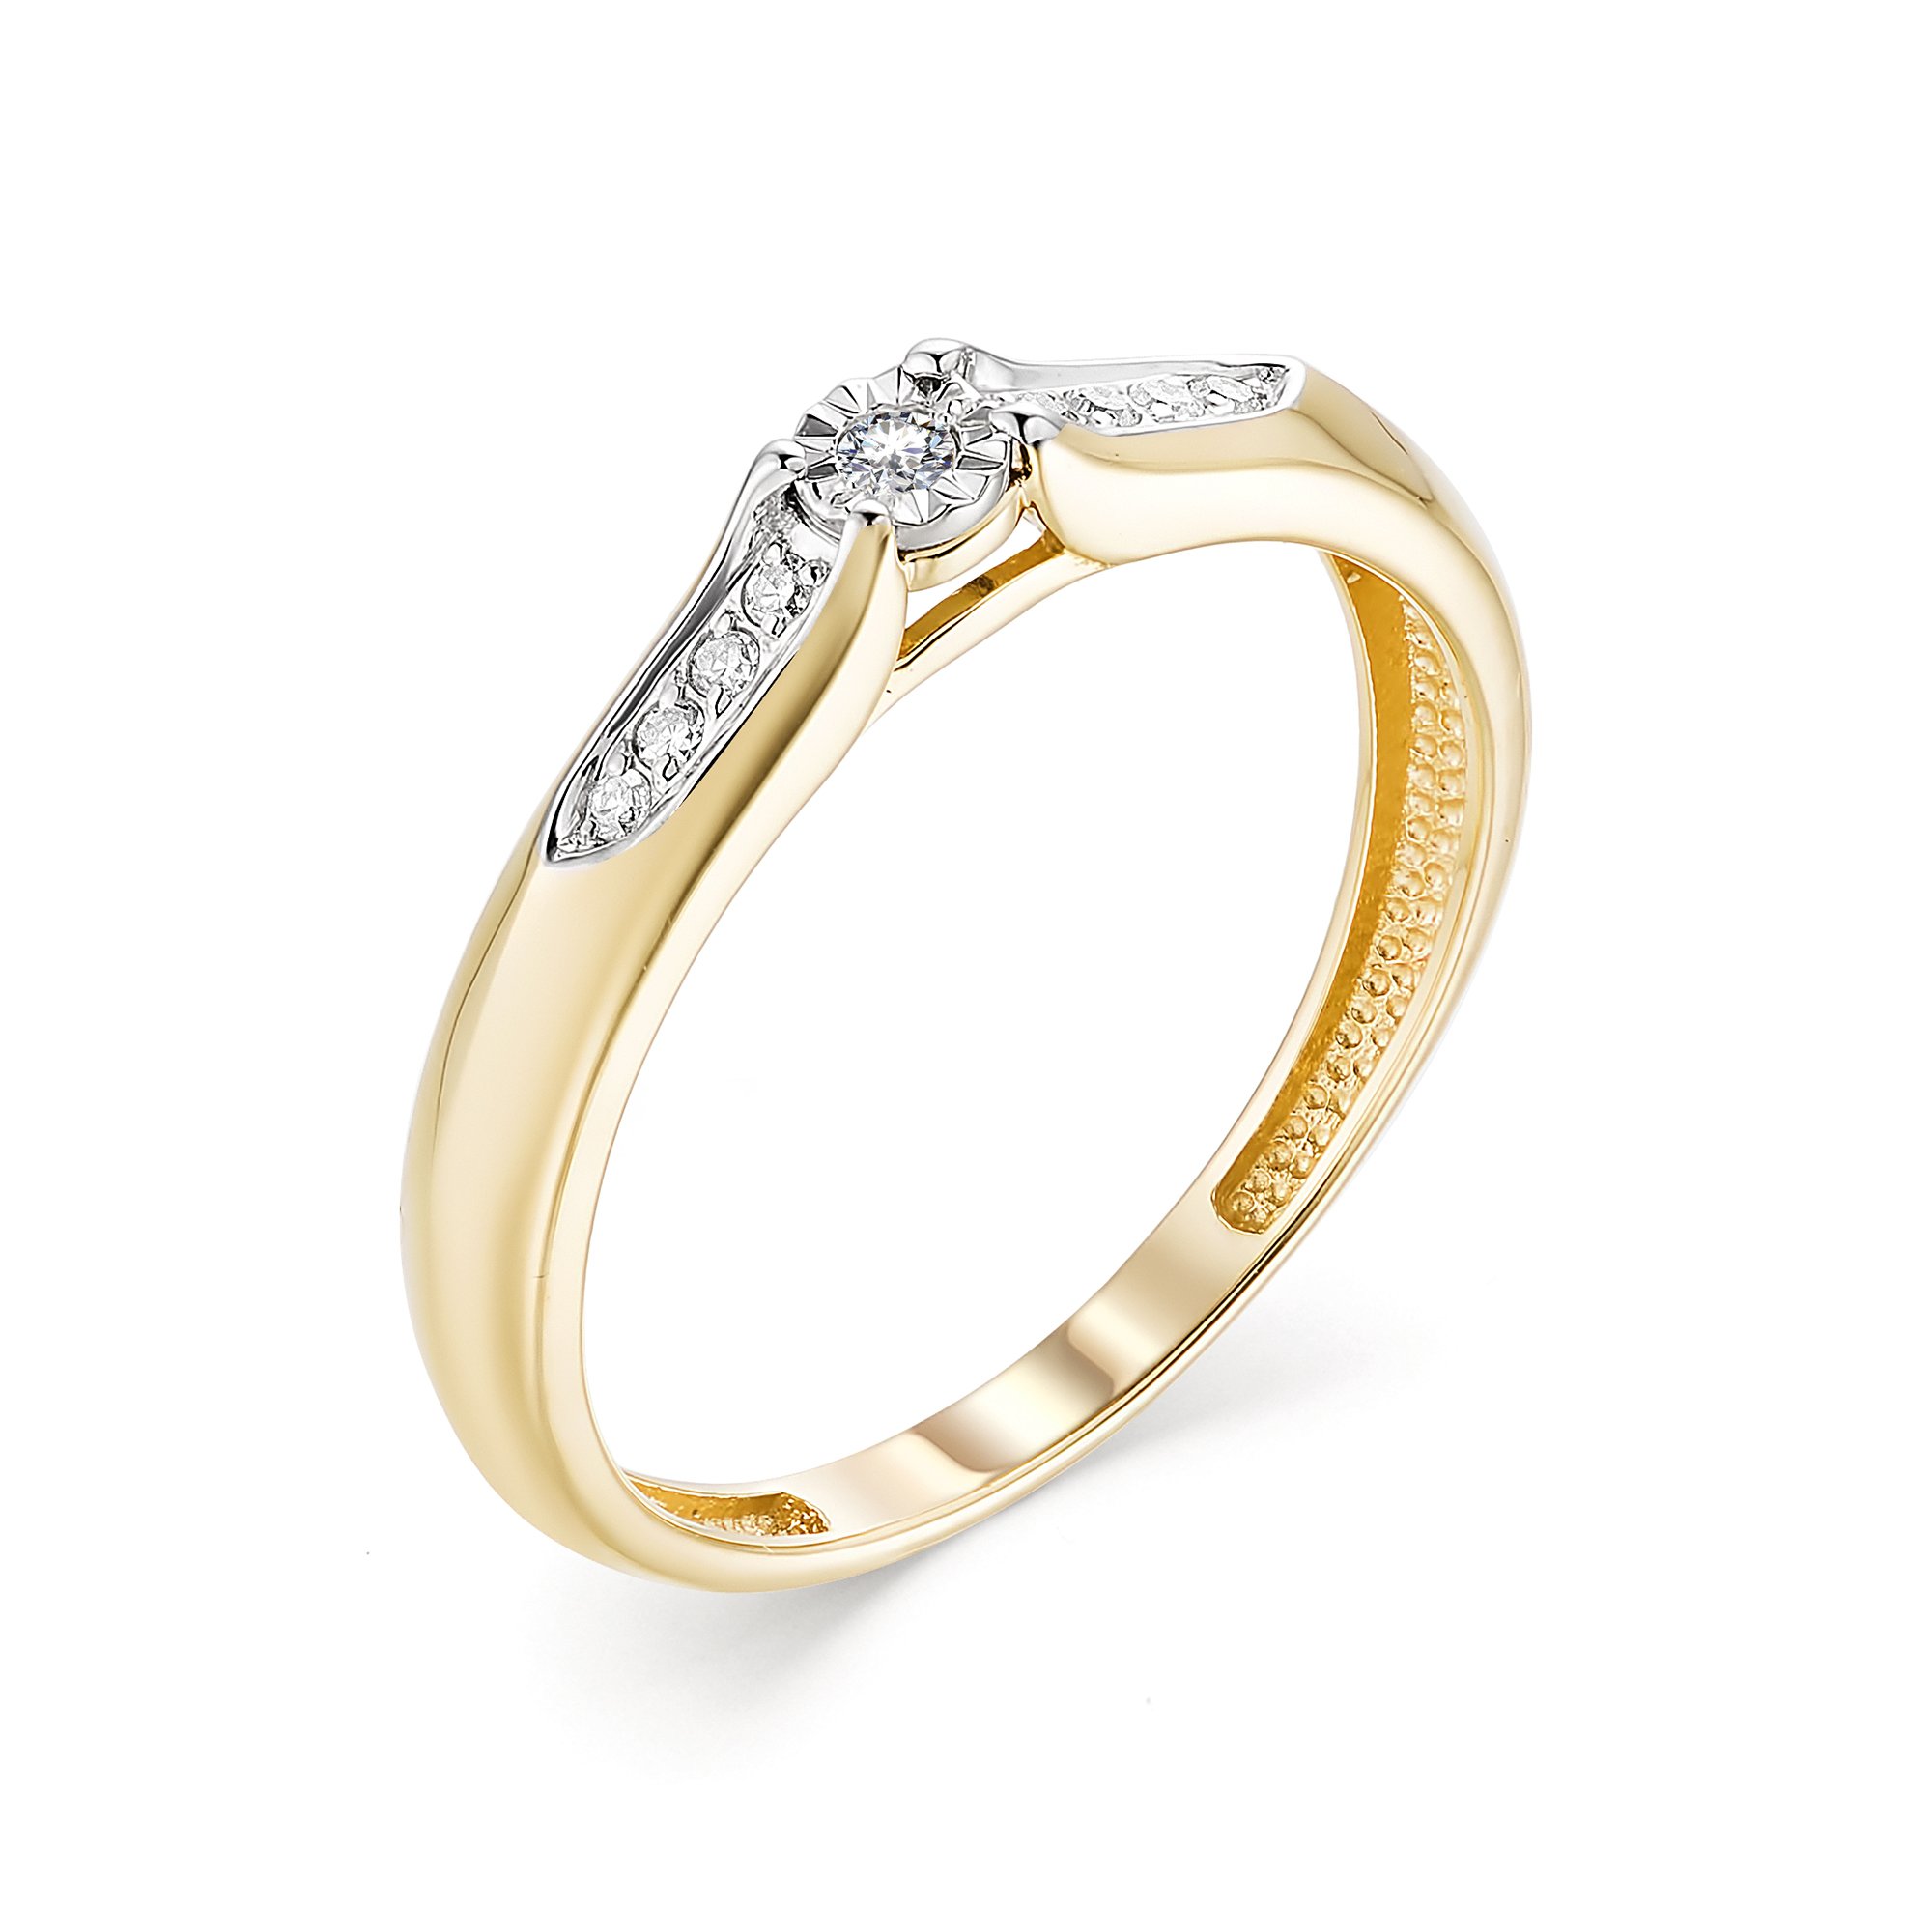 картинка кольцо 13319-300 1 бриллиант круг 17 0,020 40-60 2/3а, 8 бриллиант круг 17 0,042 200-400 2/3а 13319-300